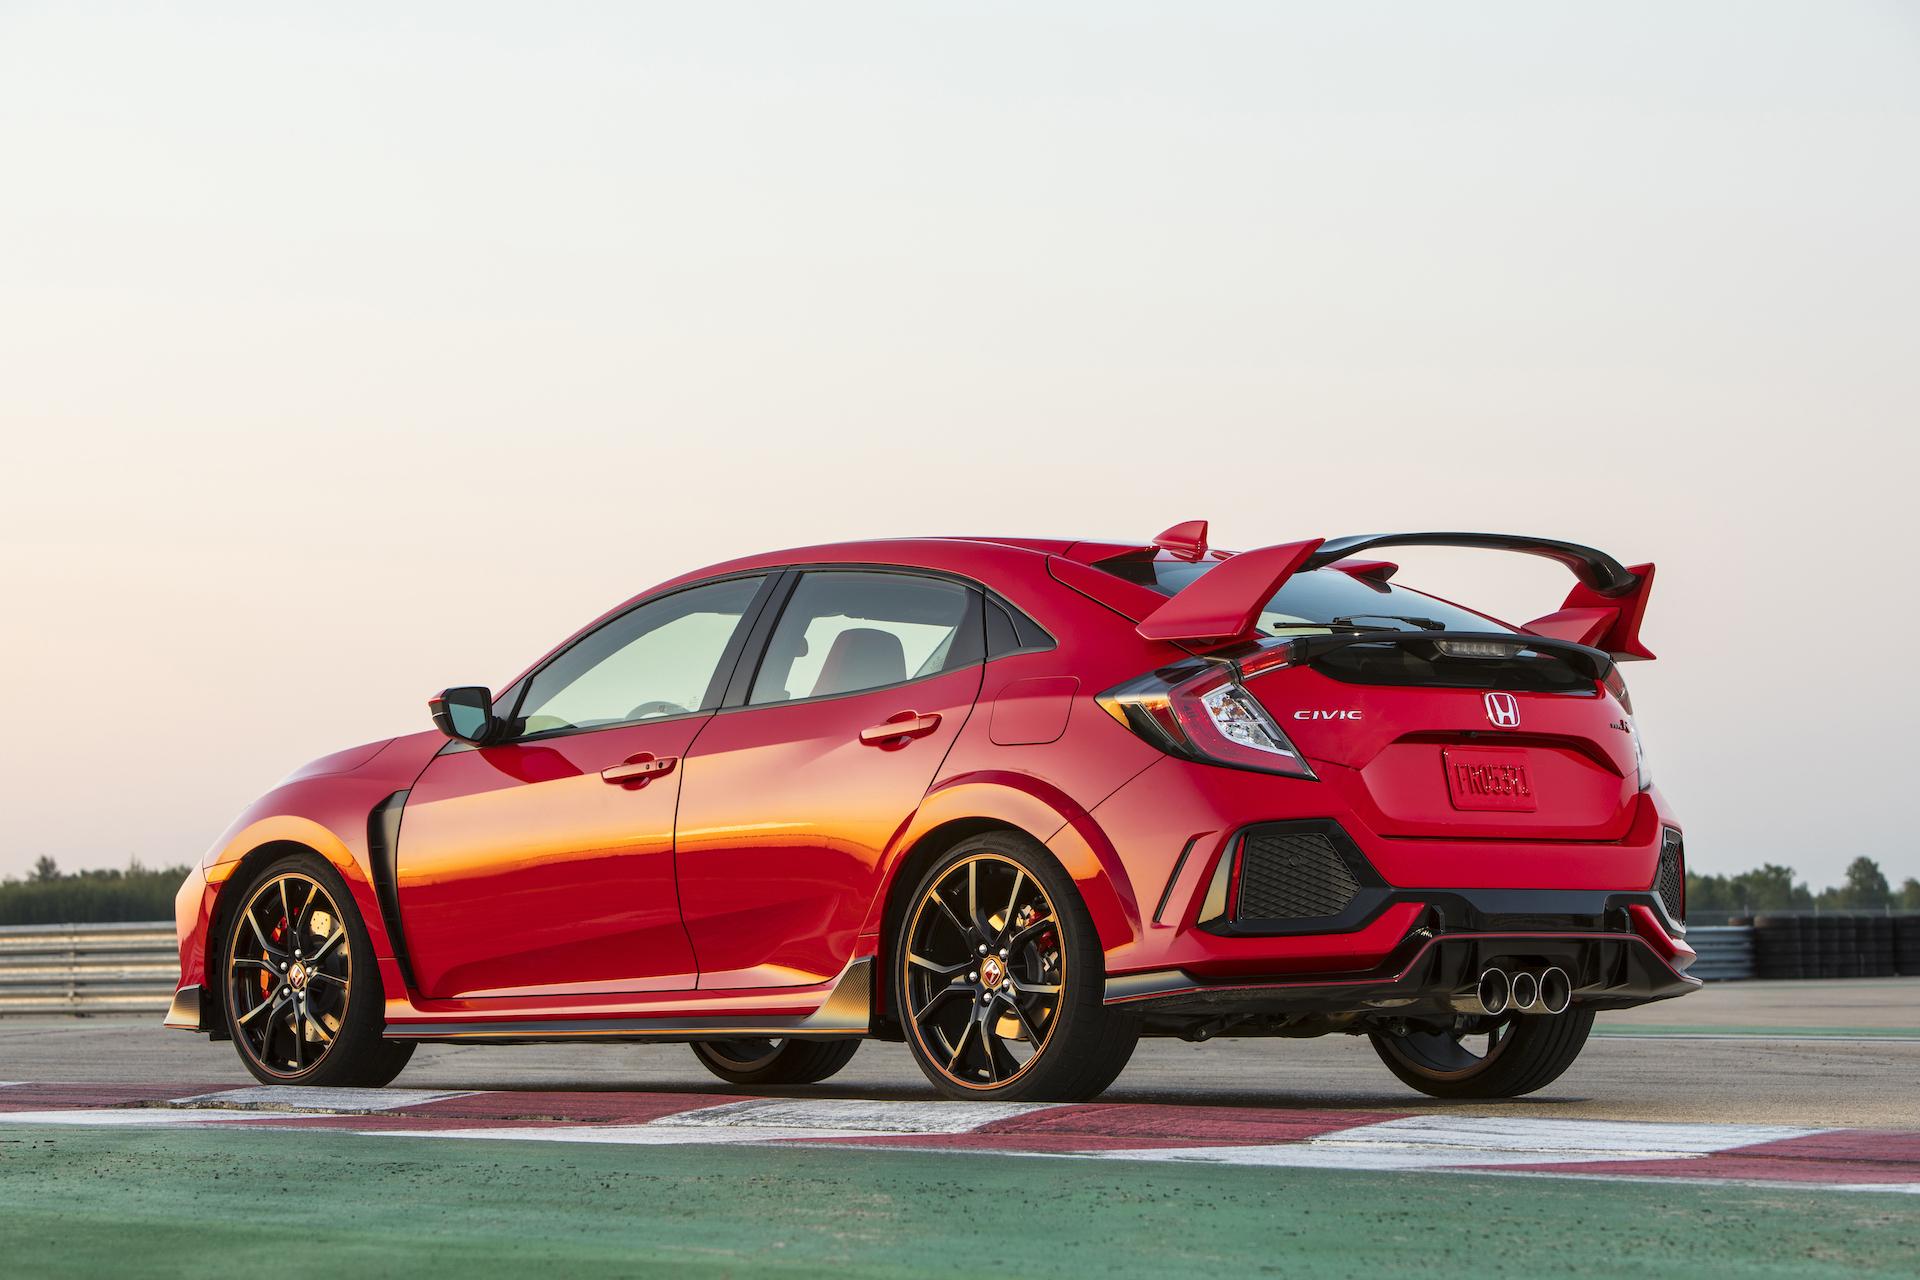 Honda Civic Srt >> Honda Civic Type R Sees Small Price Hike For 2018 Model Year